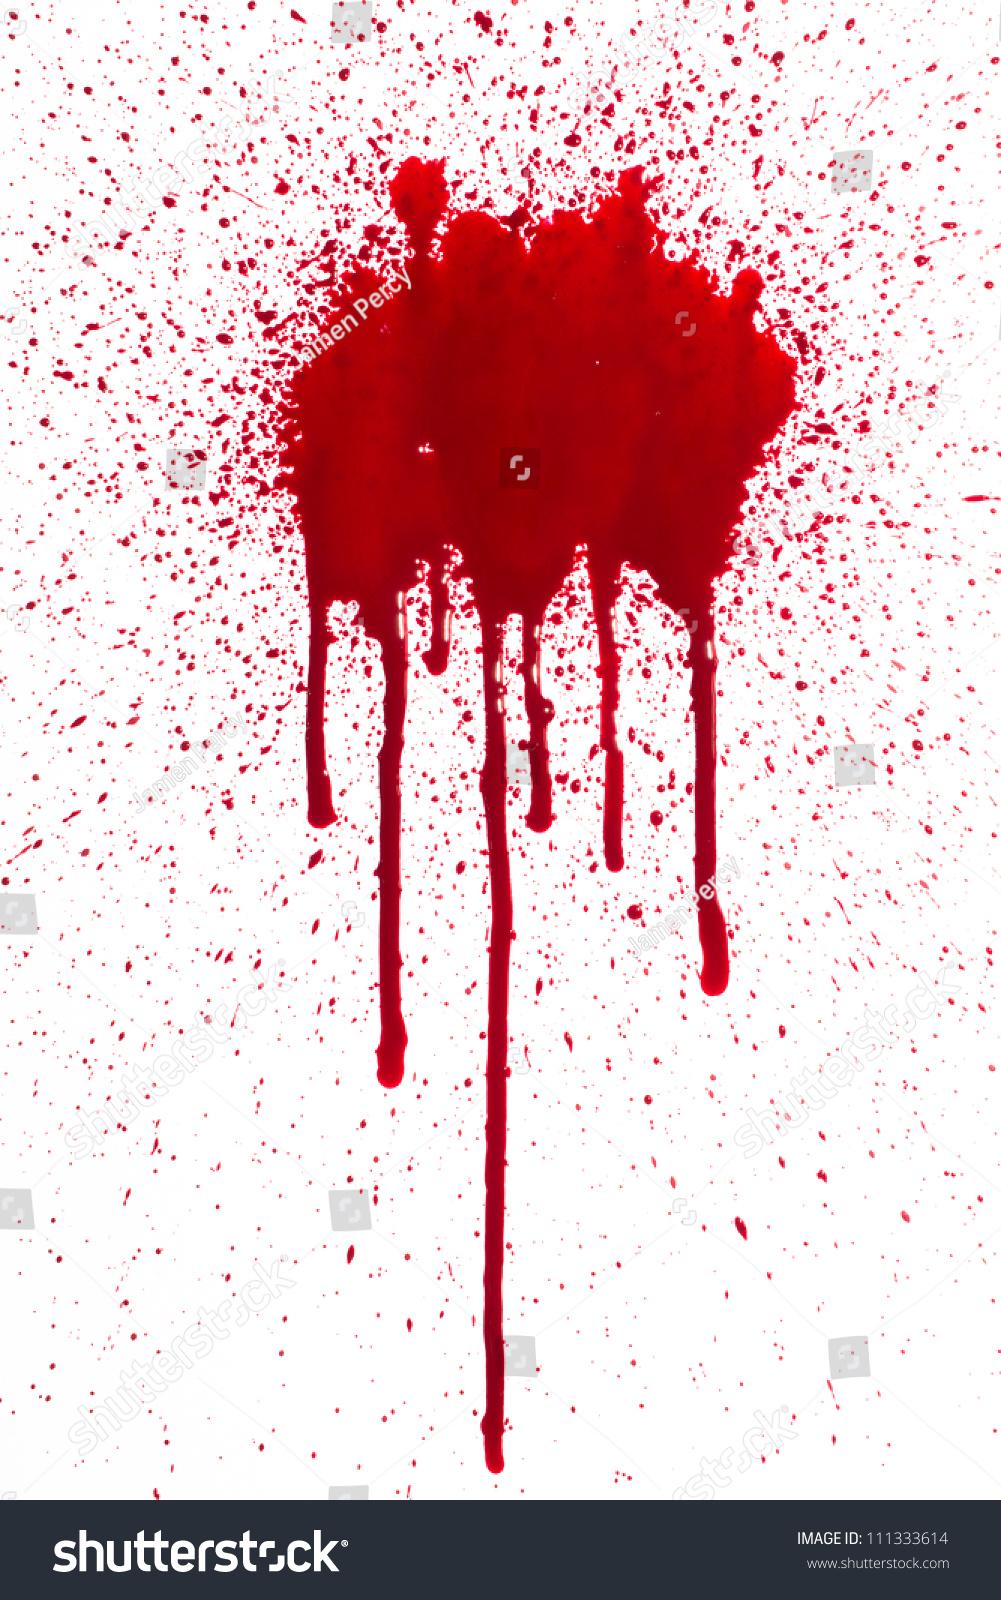 Blood Drip Stock Photo 111333614 - Shutterstock